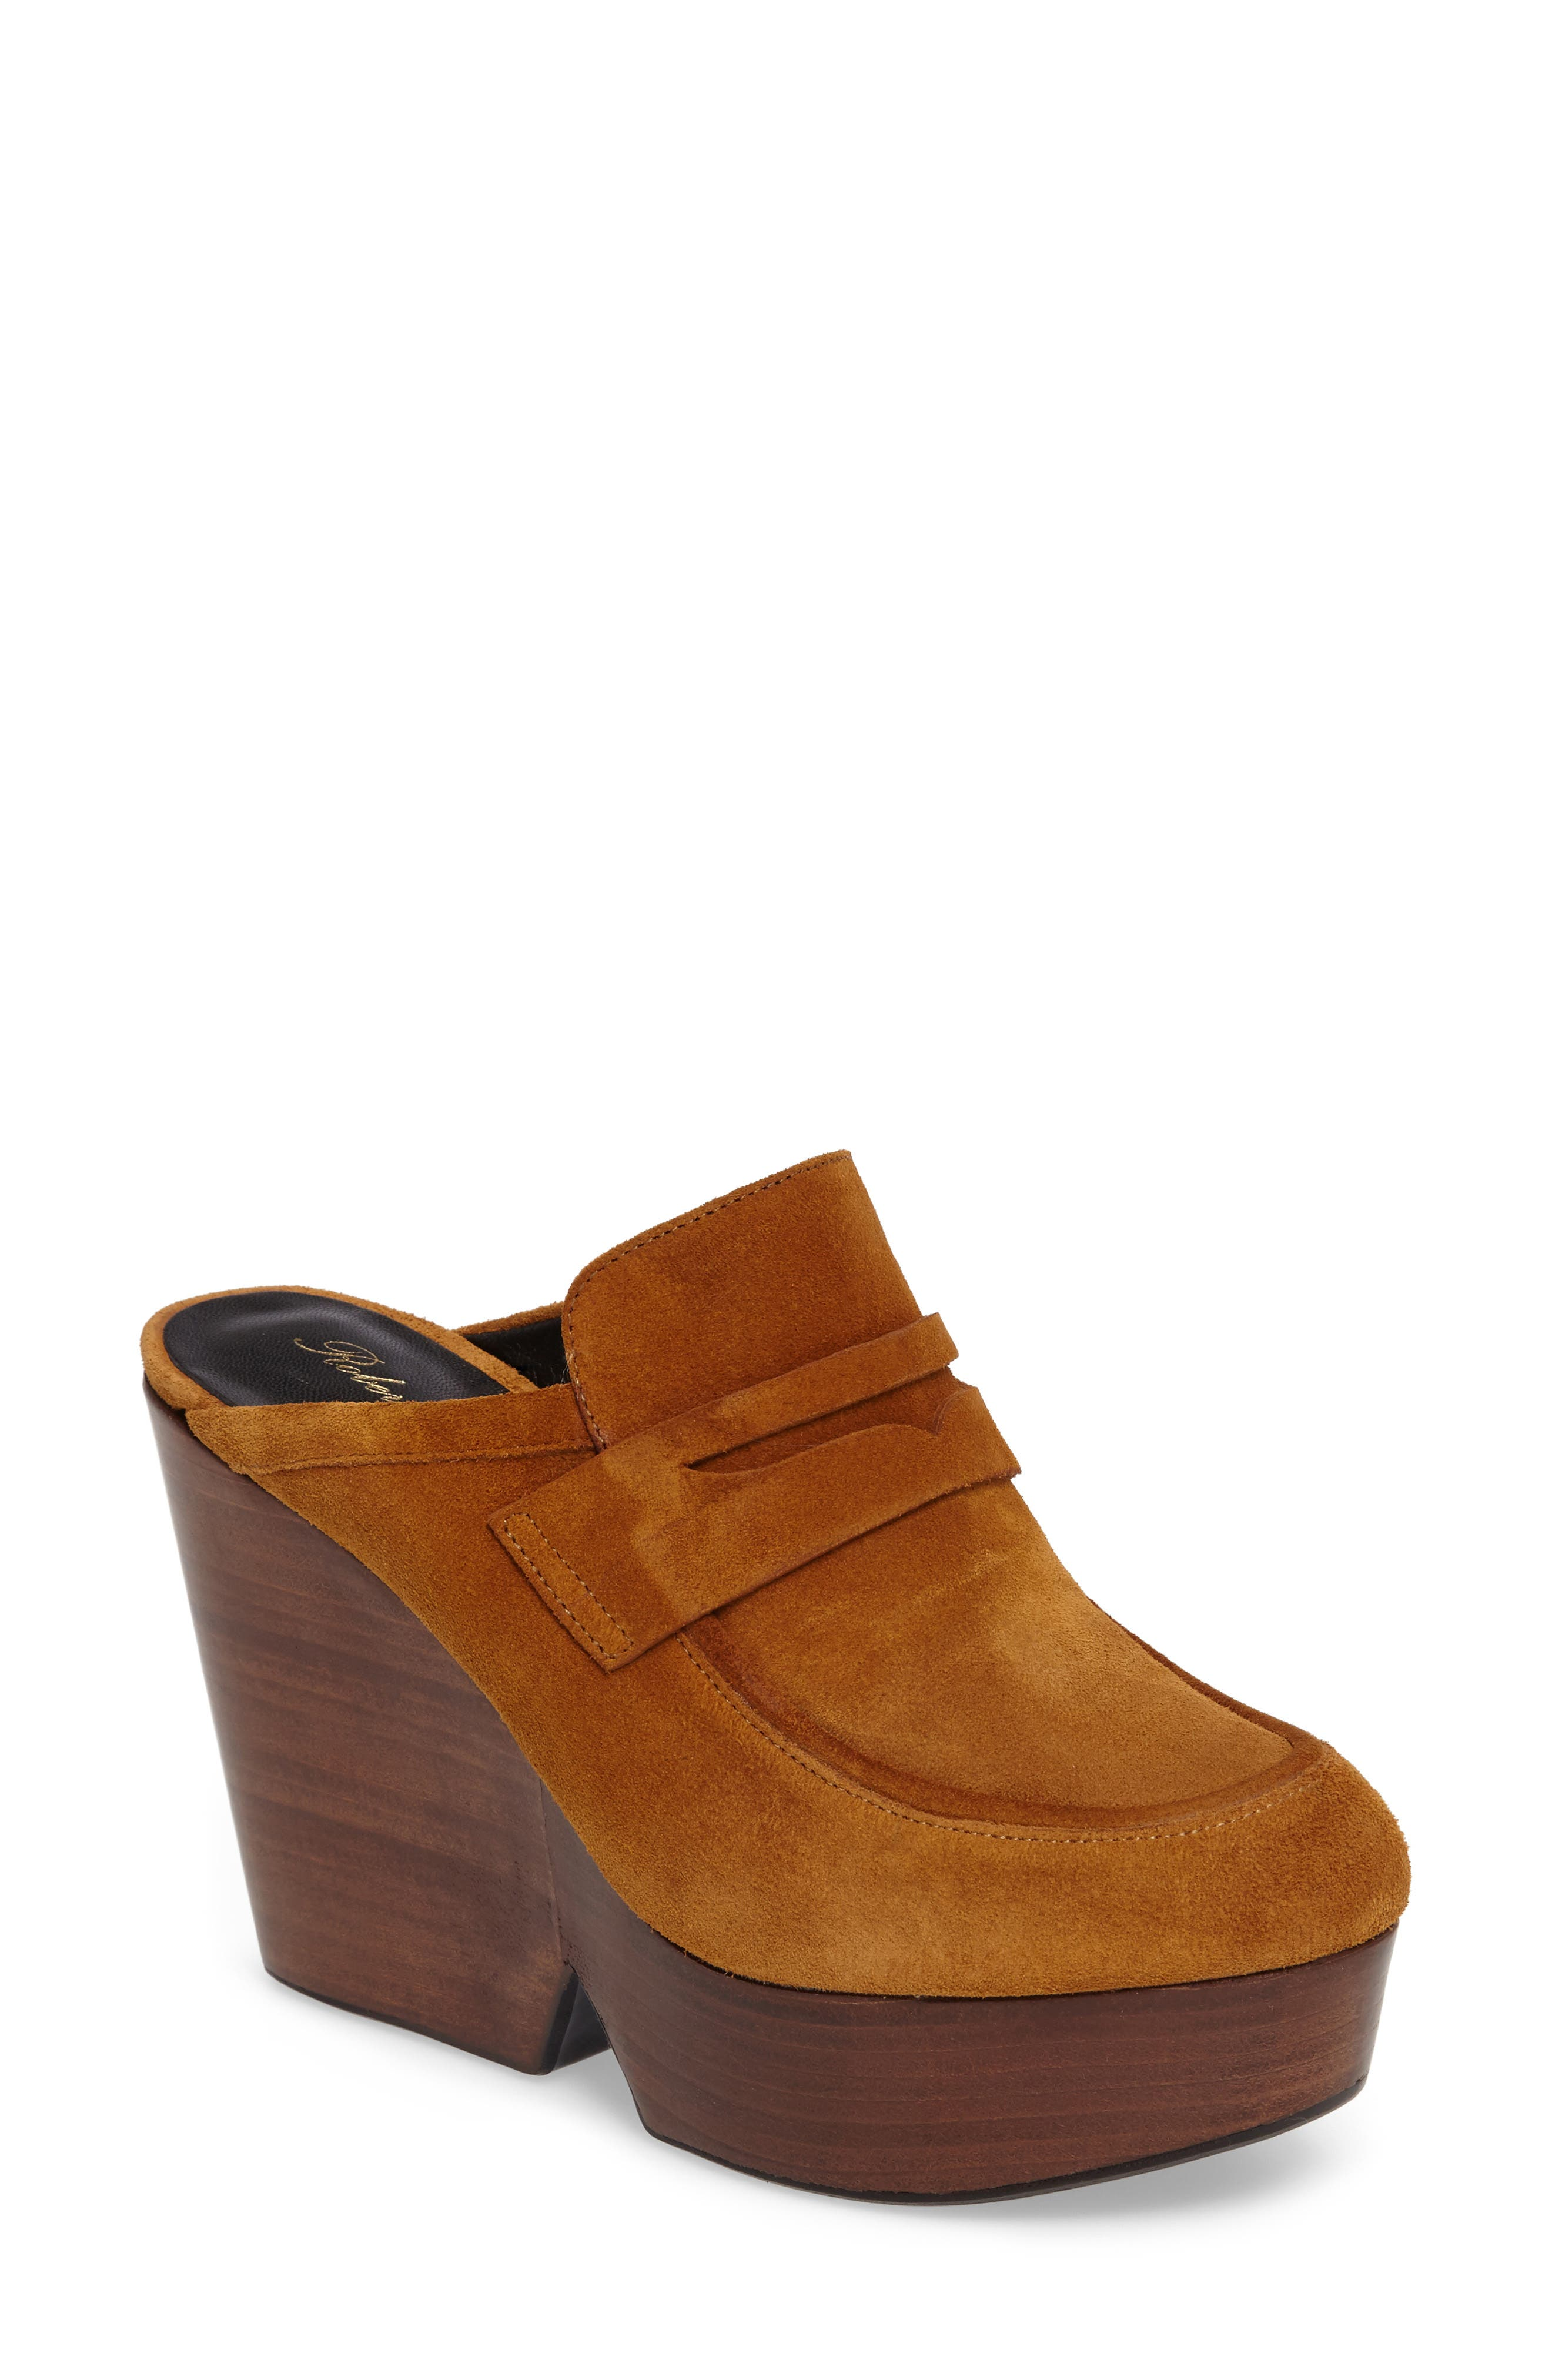 Alternate Image 1 Selected - Robert Clergerie Damor Platform Loafer Mule (Women)